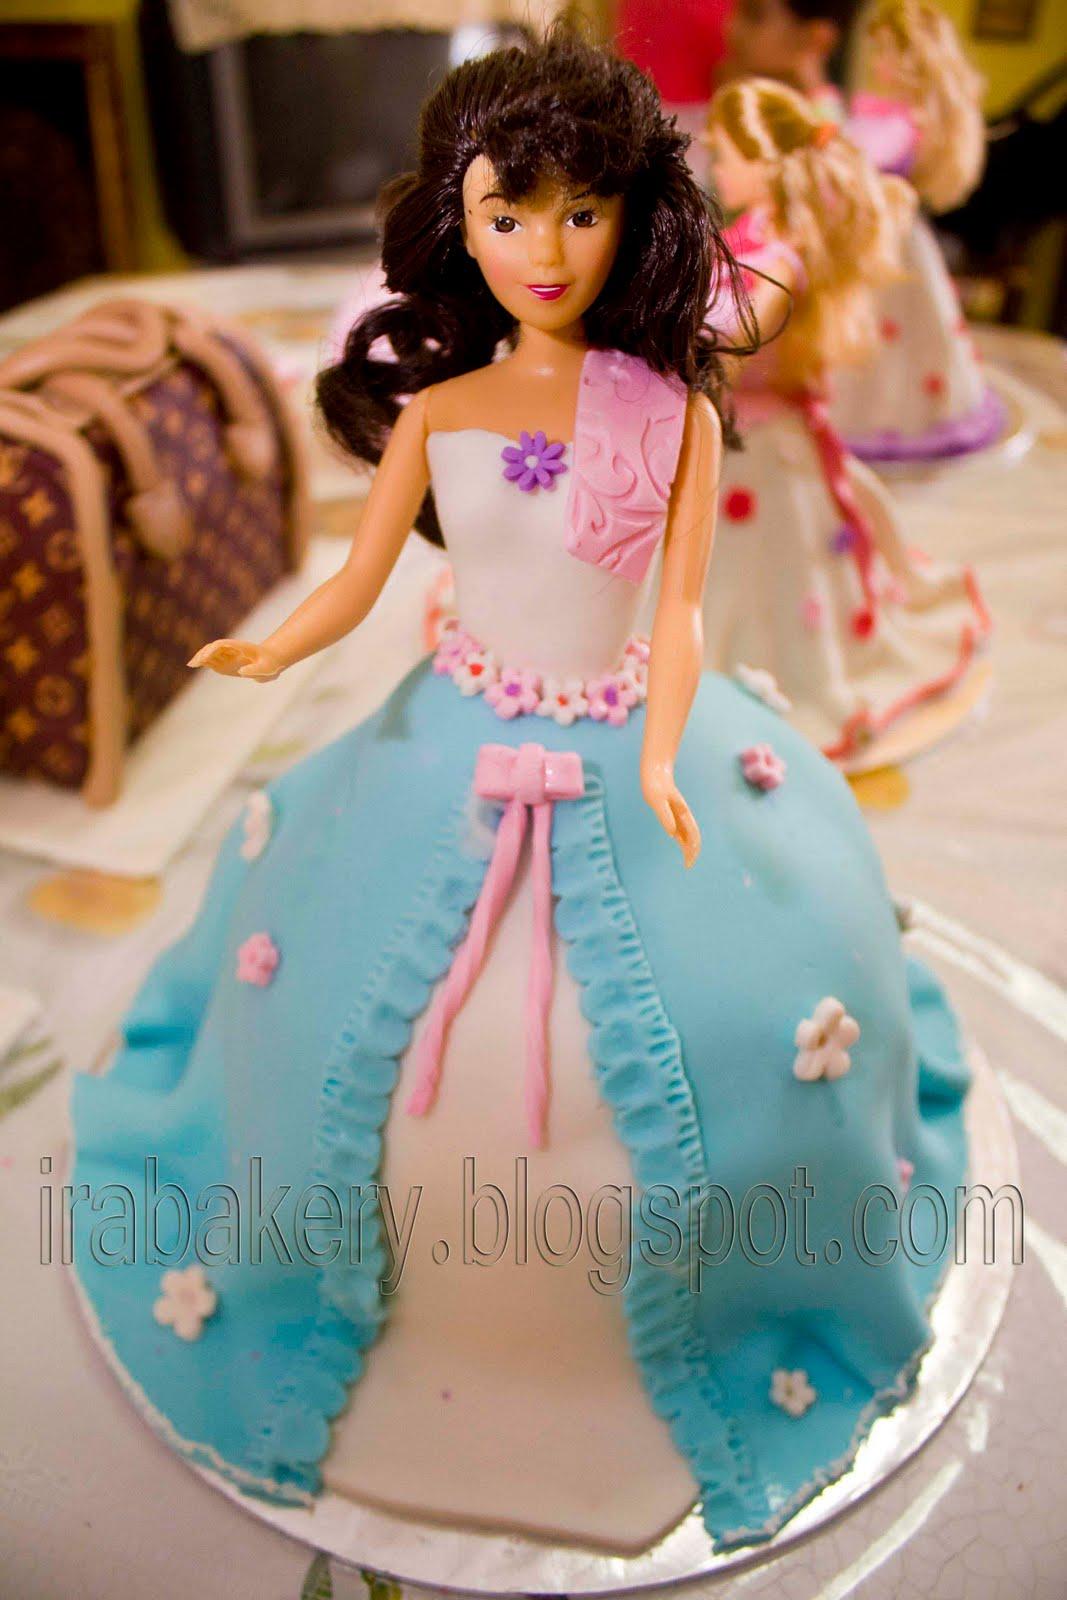 Decoration Of Barbie Cake : Deco Cakes, Cupcakes, Cheese cake & Kek Lapis Sarawak in ...